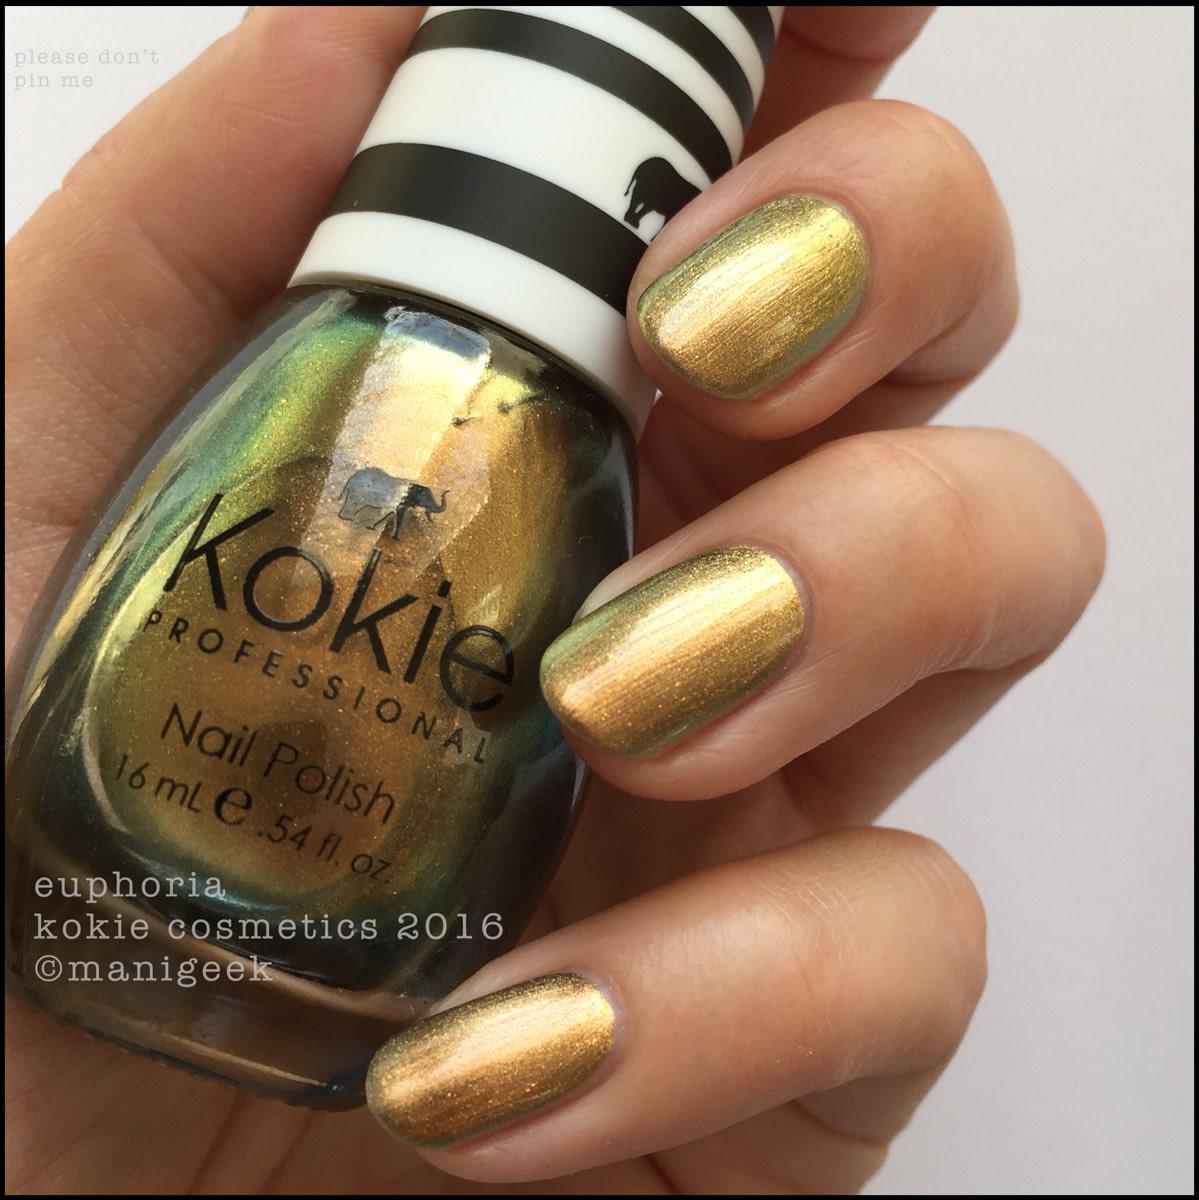 Kokie Euporia Polish Shade_Kokie Cosmetics Nail Polish Swatches 2016